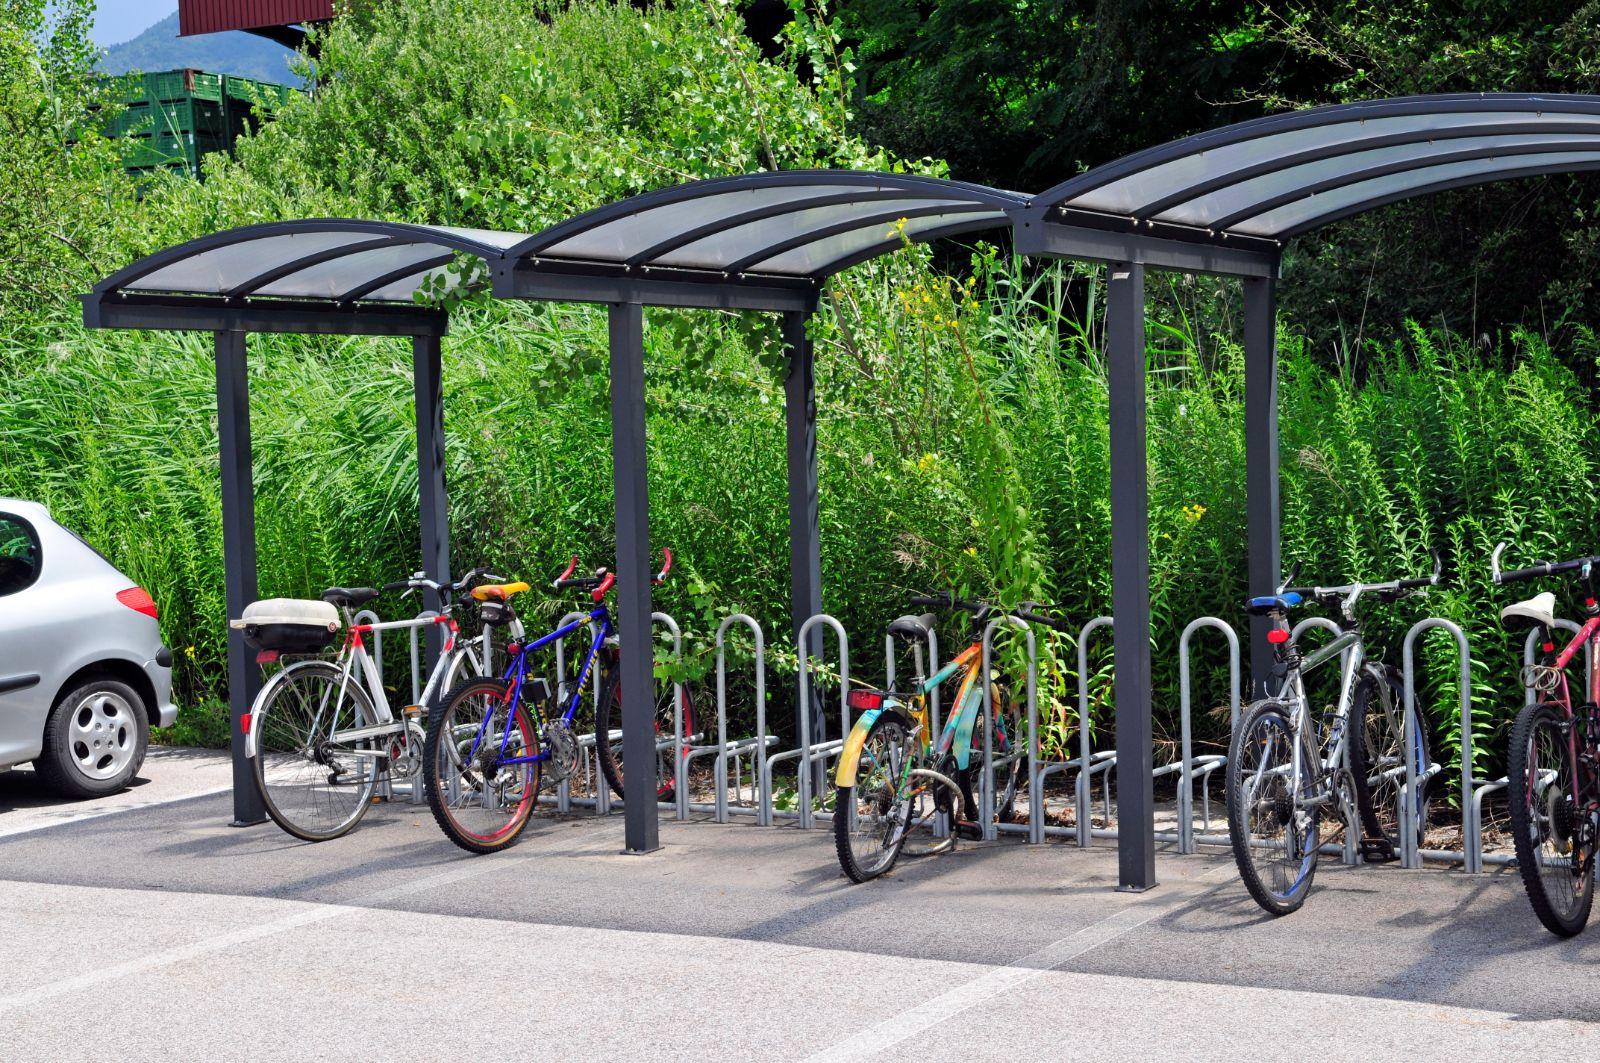 Galleria bike rack | Bike racks + storage